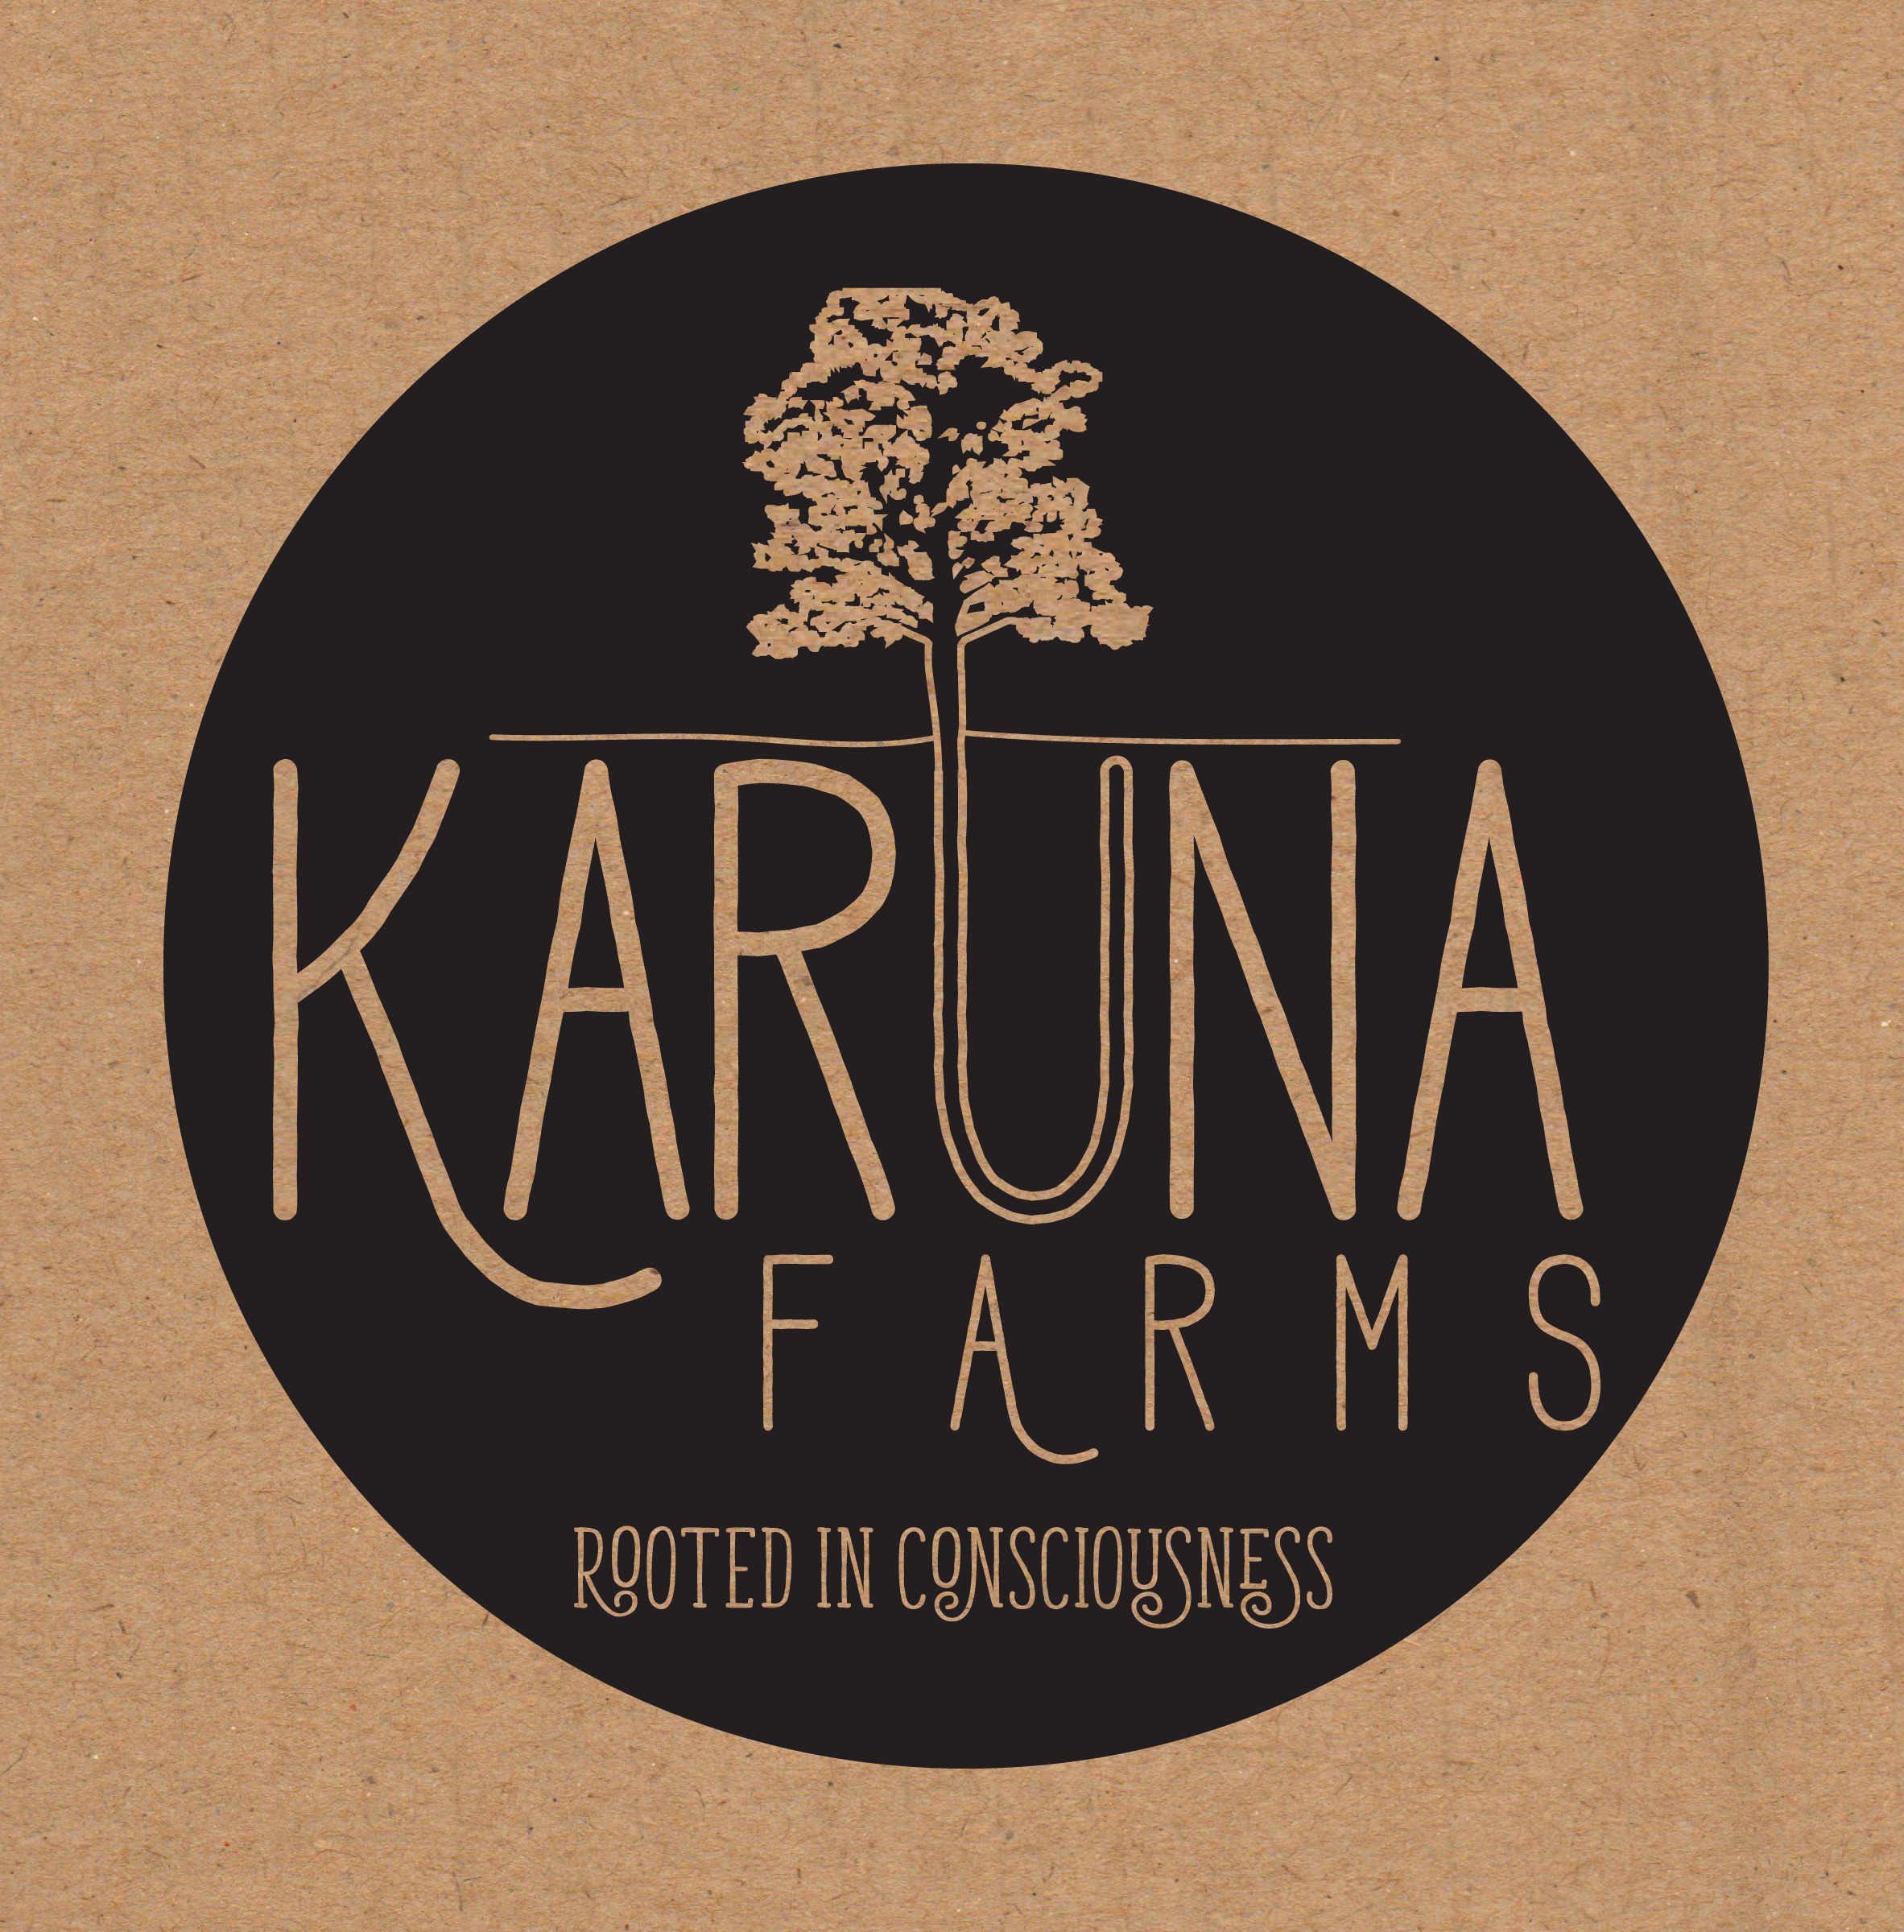 Karuna-Farms-Logo-2-9.png